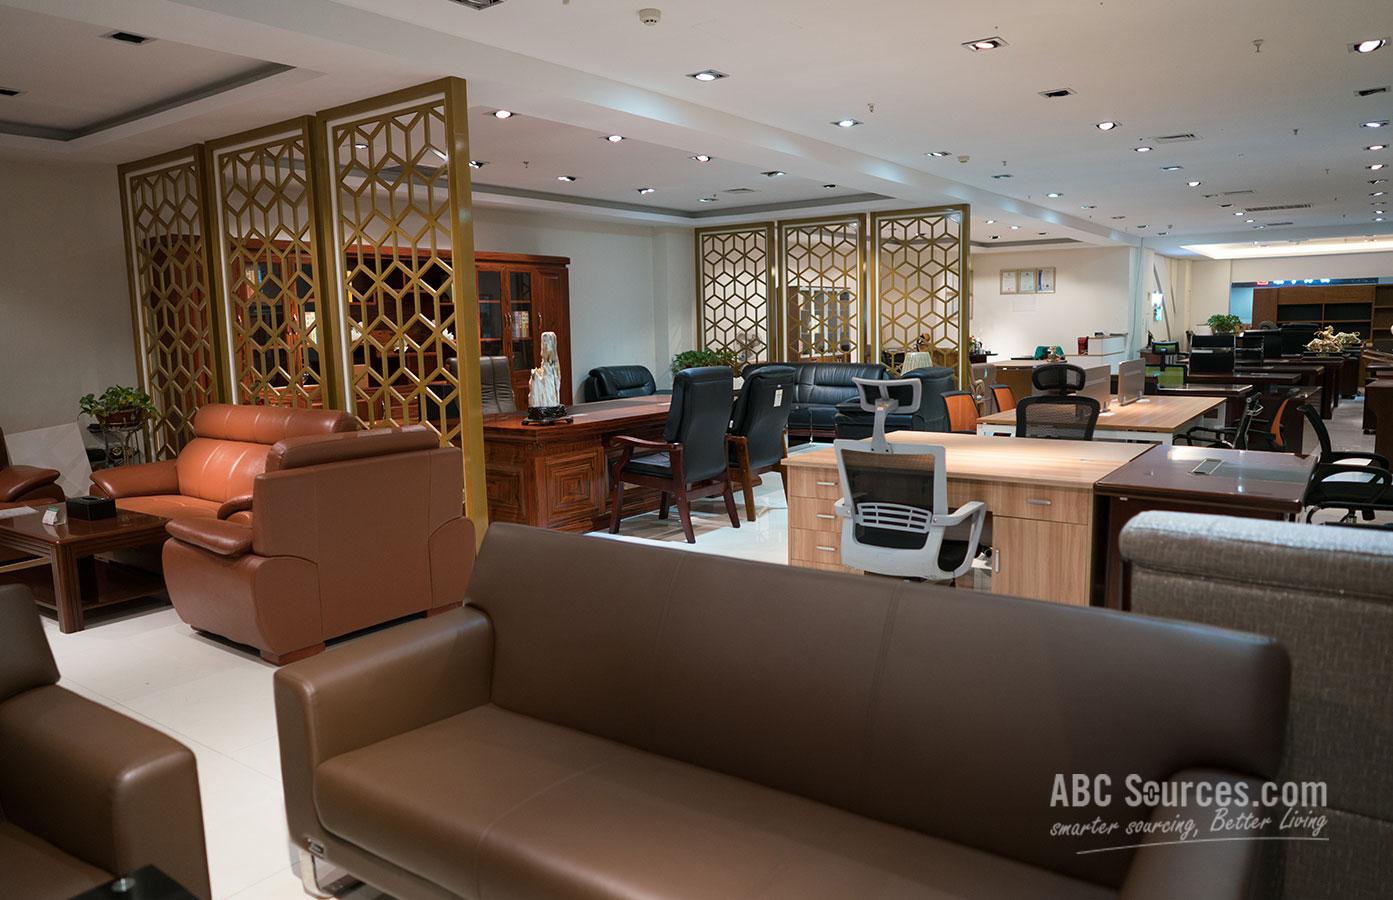 Yiwu International Household Furniture City